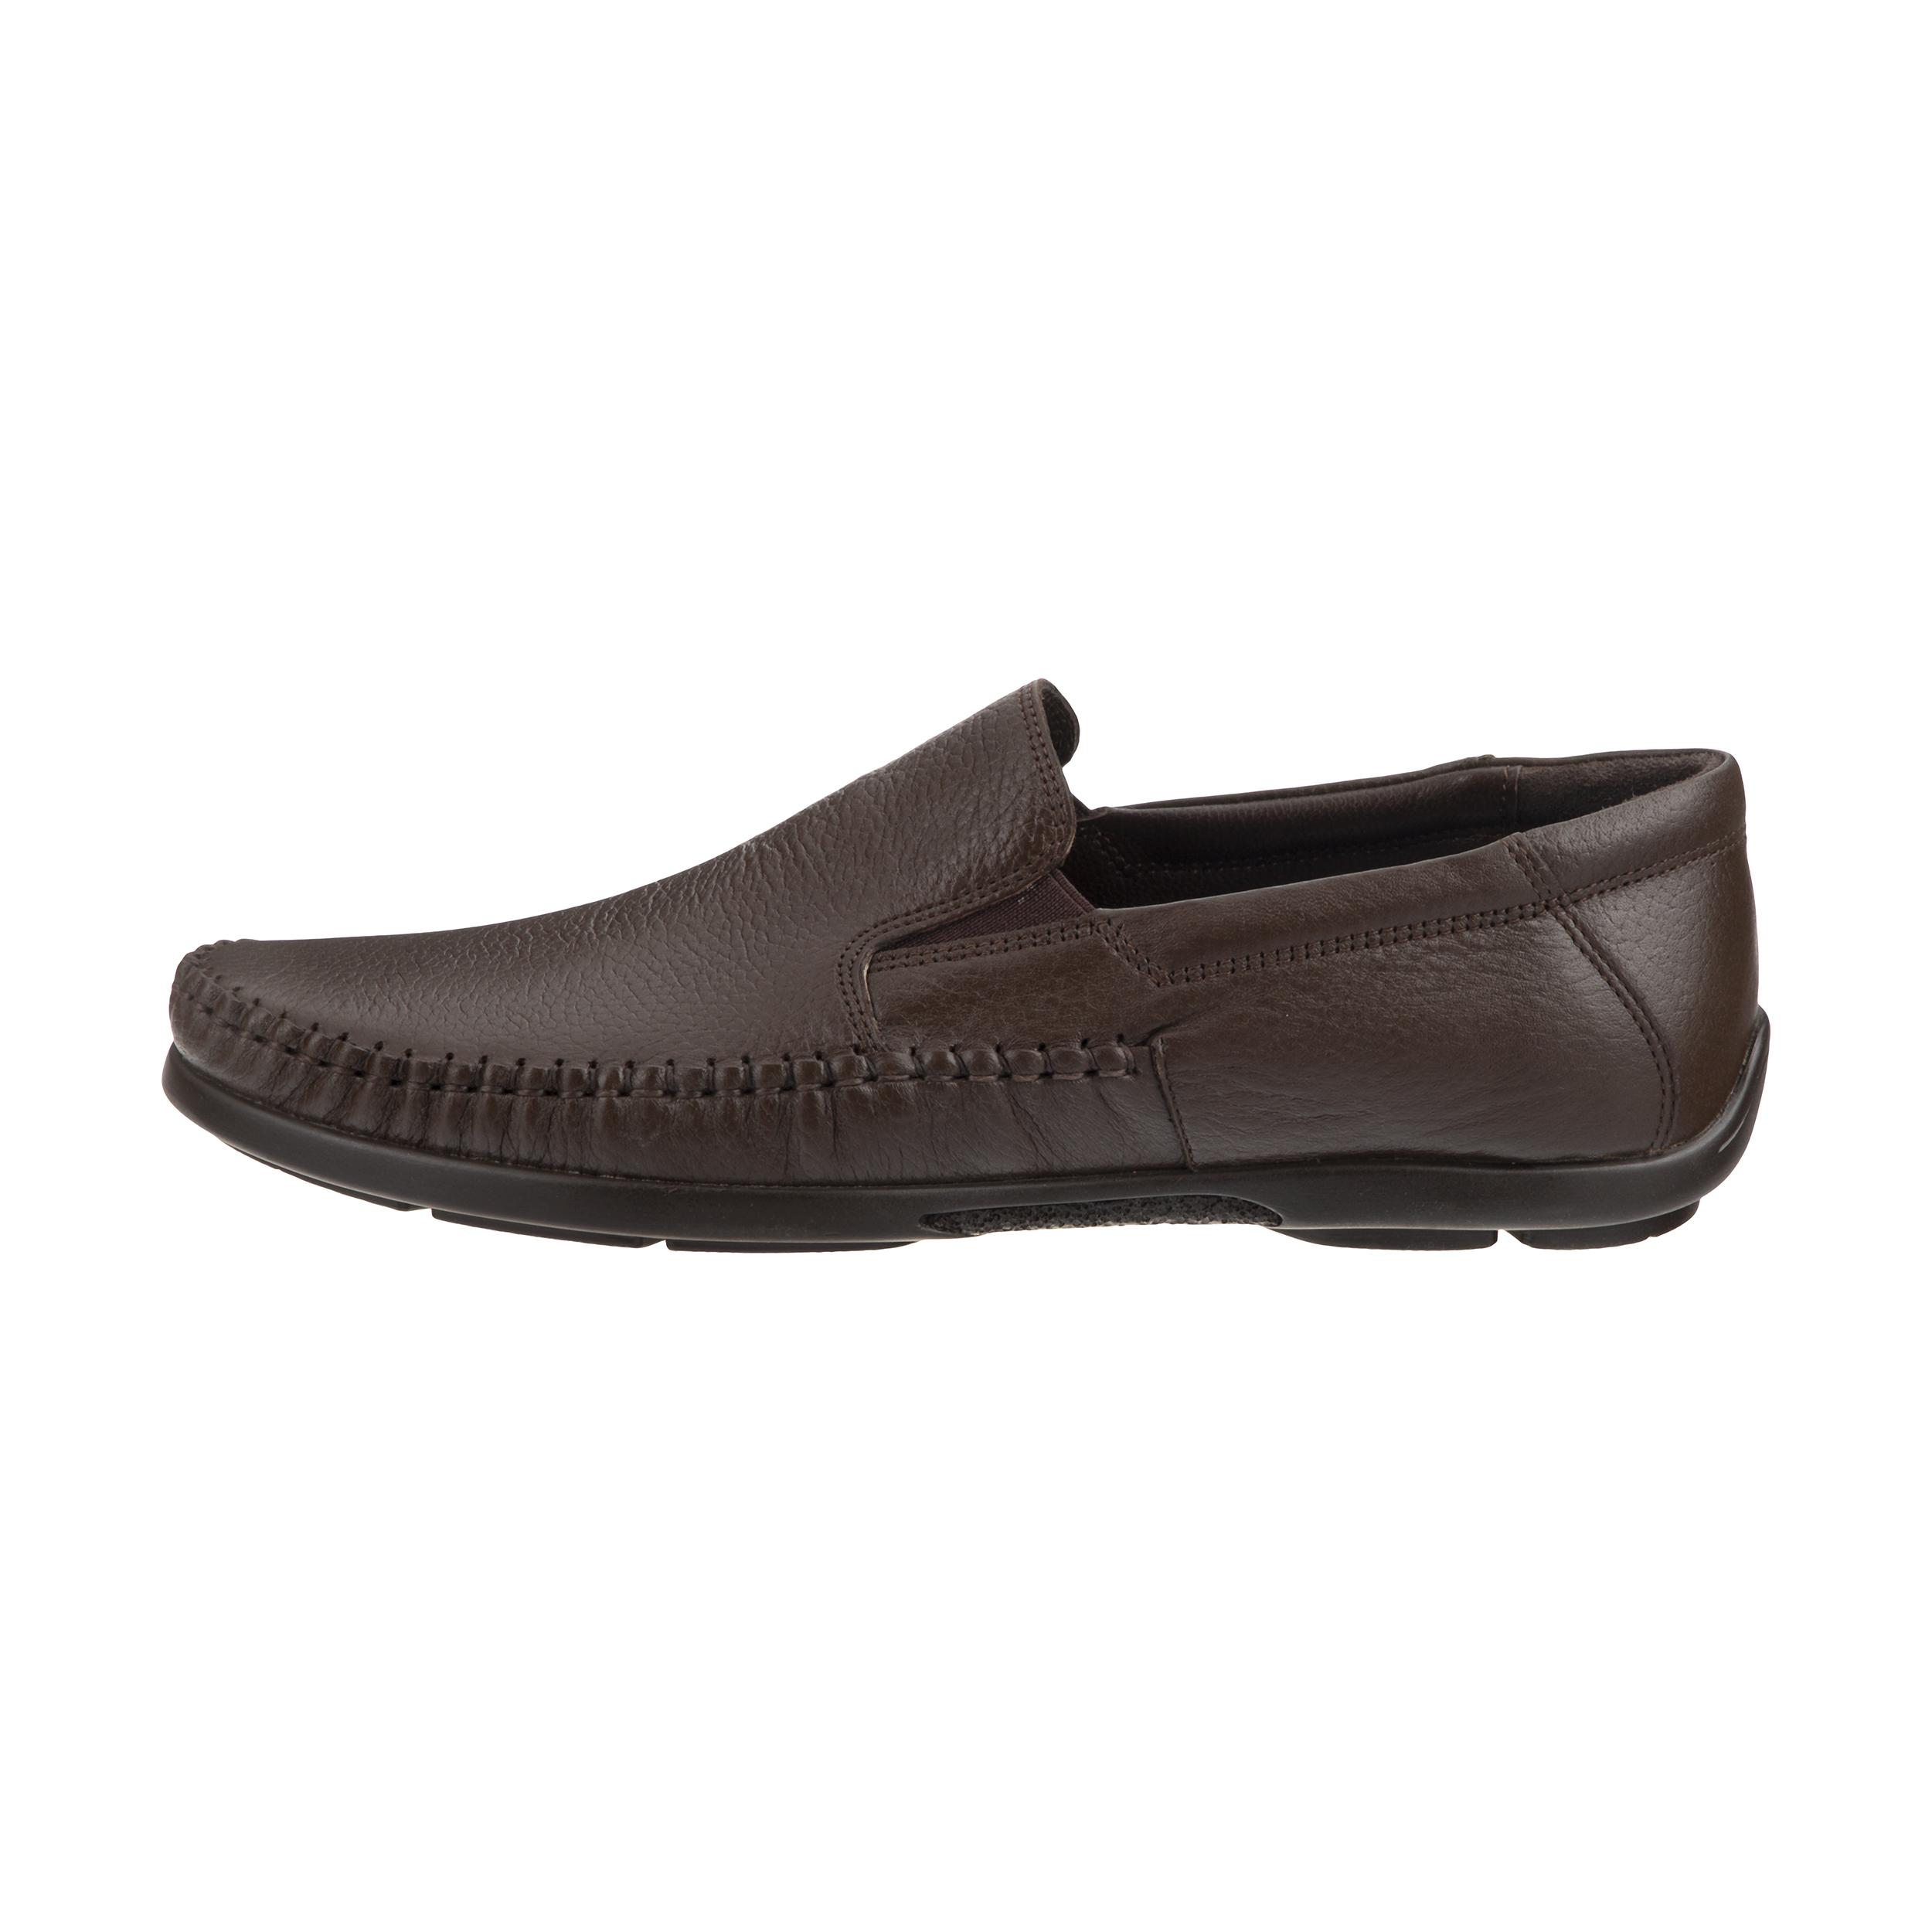 کفش روزمره مردانه بلوط مدل 7233B503104